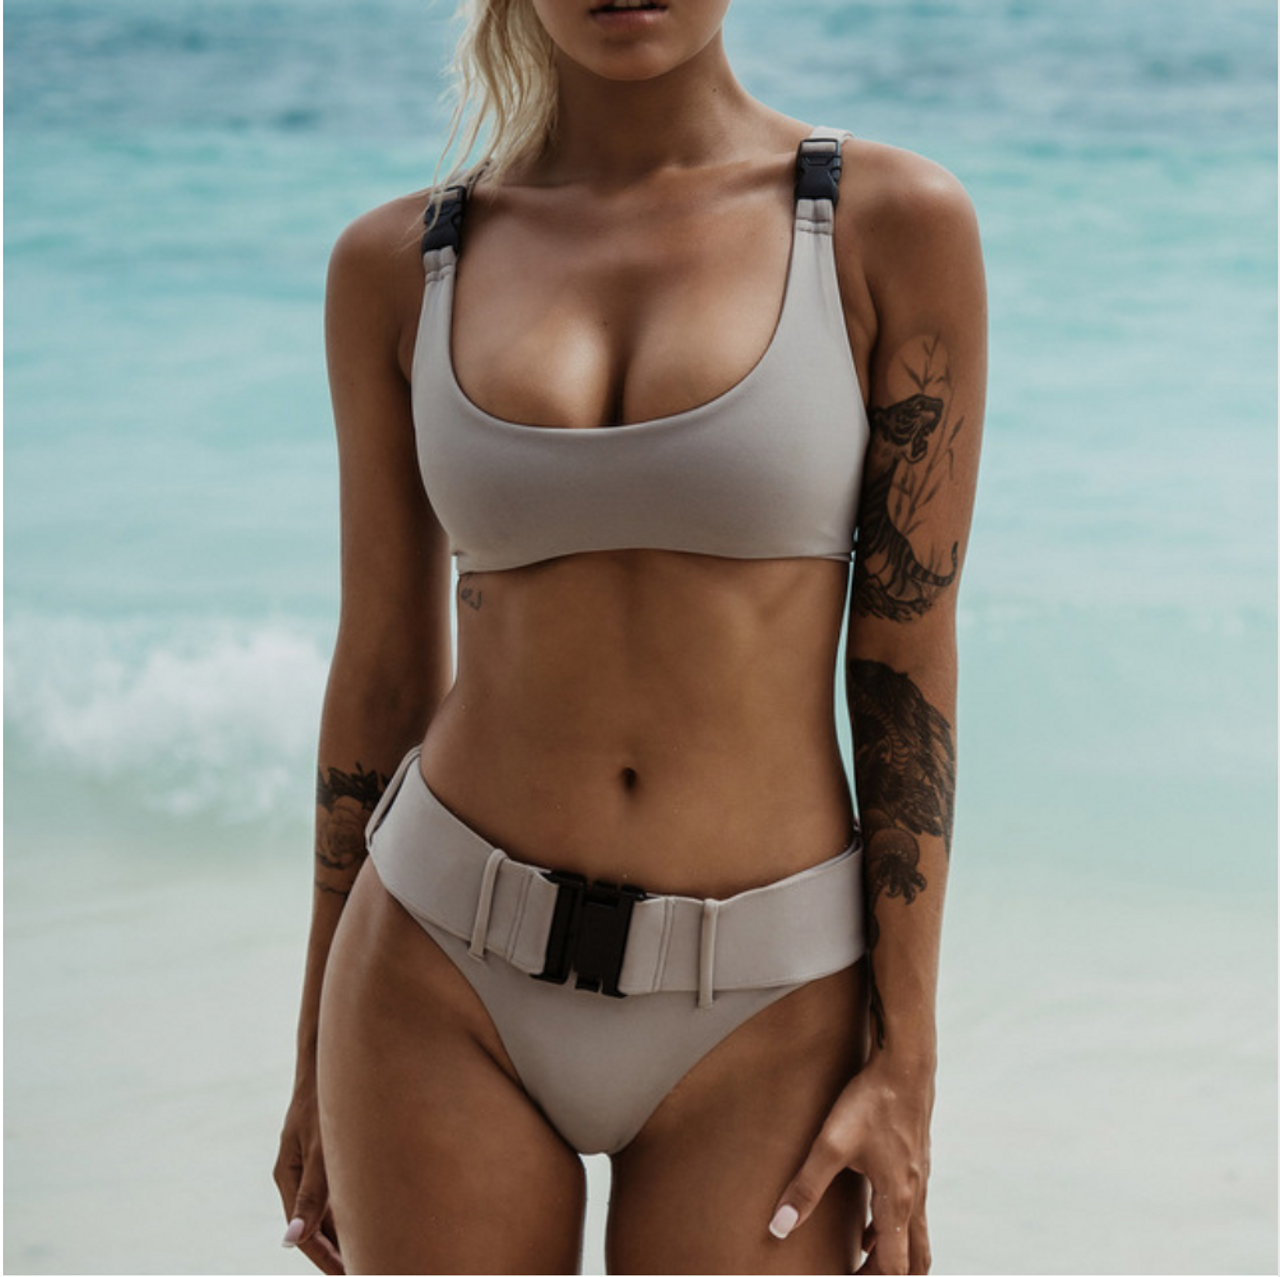 356f4f95060 2018 Biquini White Sexy High Cut Brazilian Thong Bikinis Women Swimsuit  Triangle Molle Buckle Girls Swimwear Women Bathing Suits